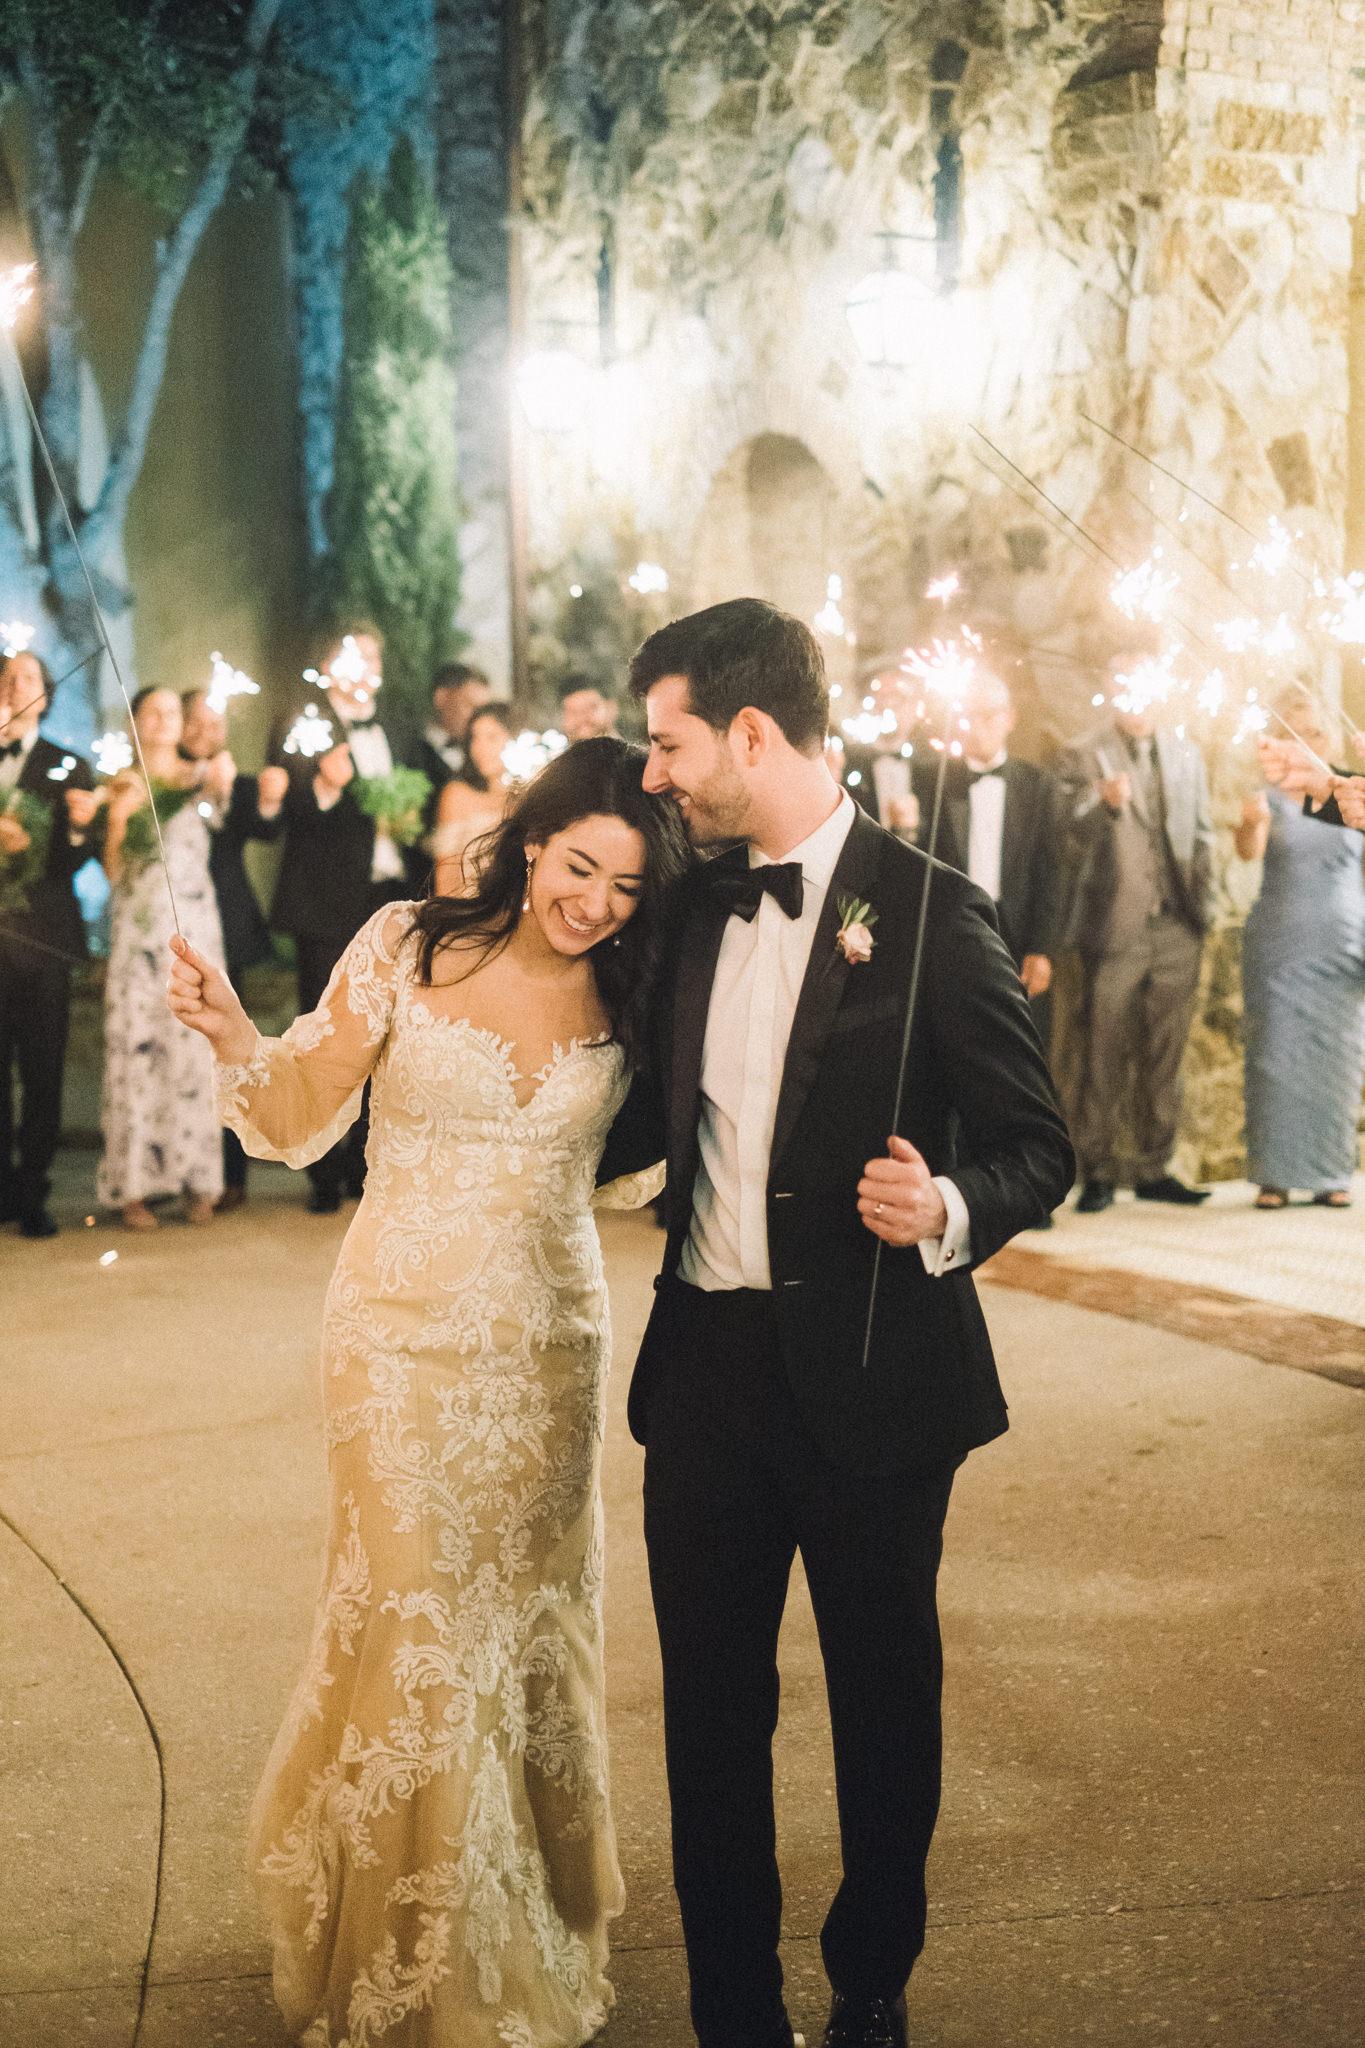 wedding sparkler exit with no flash